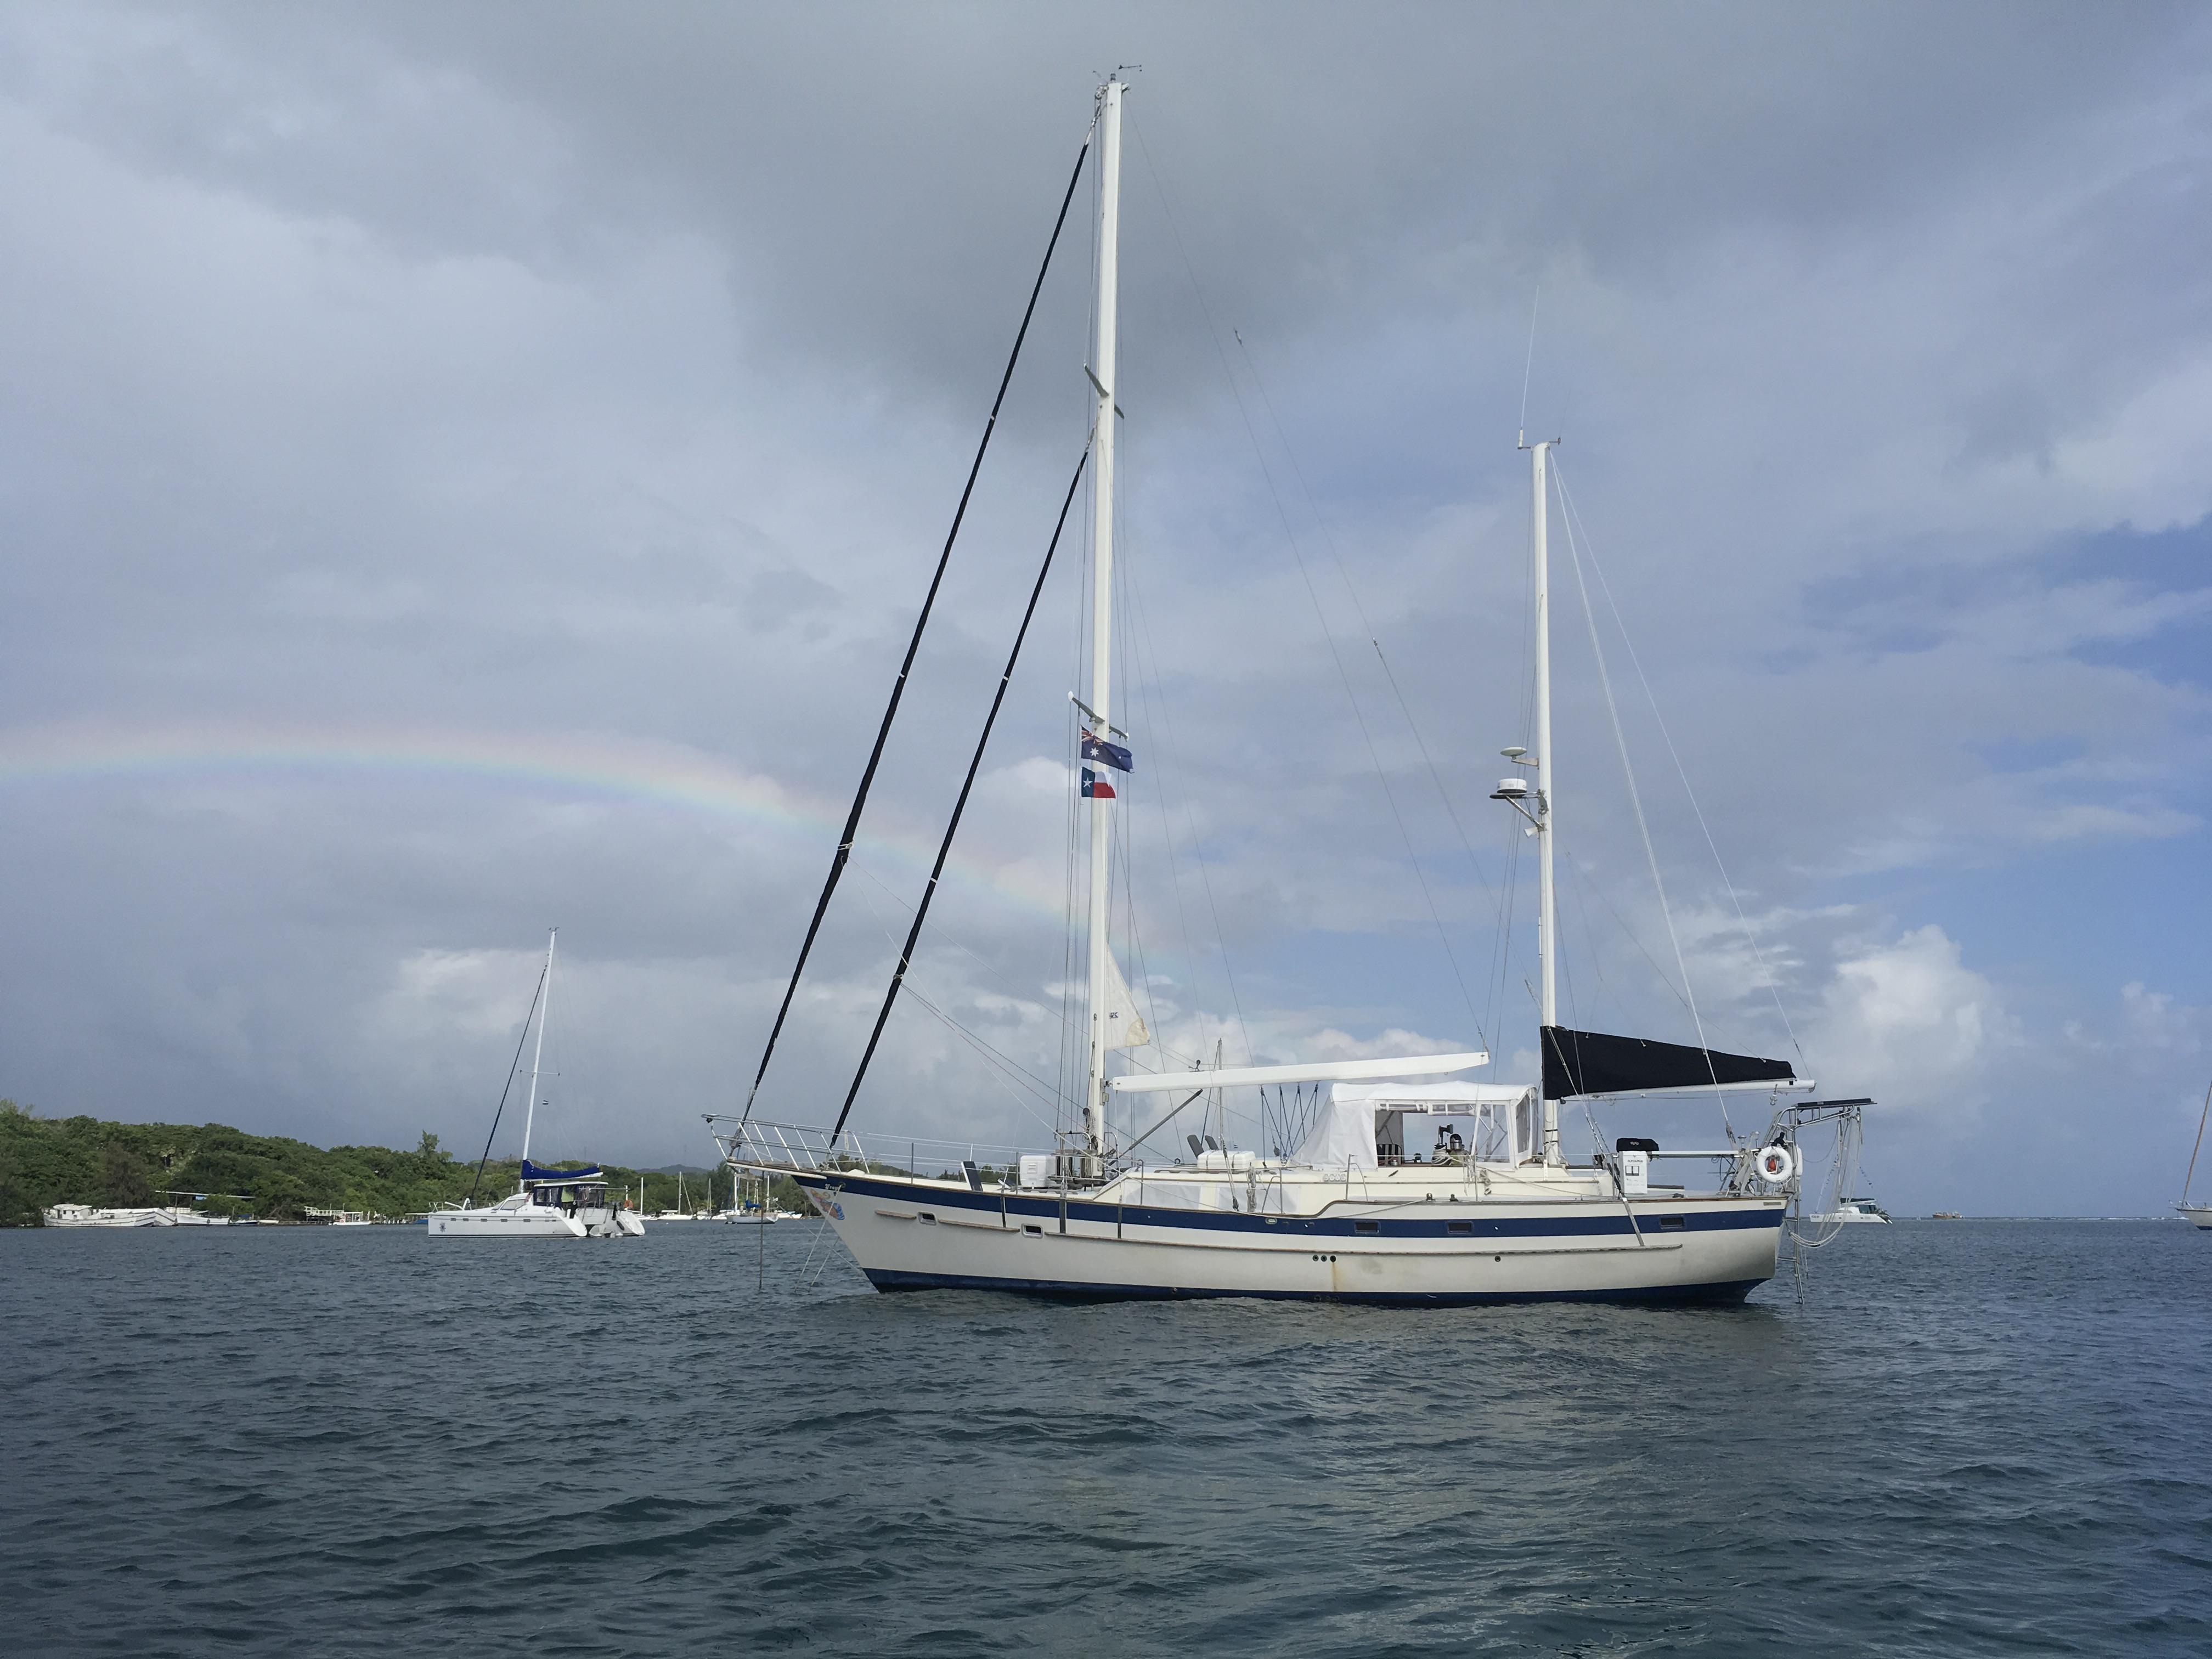 Honduras. Sailing yacht freya